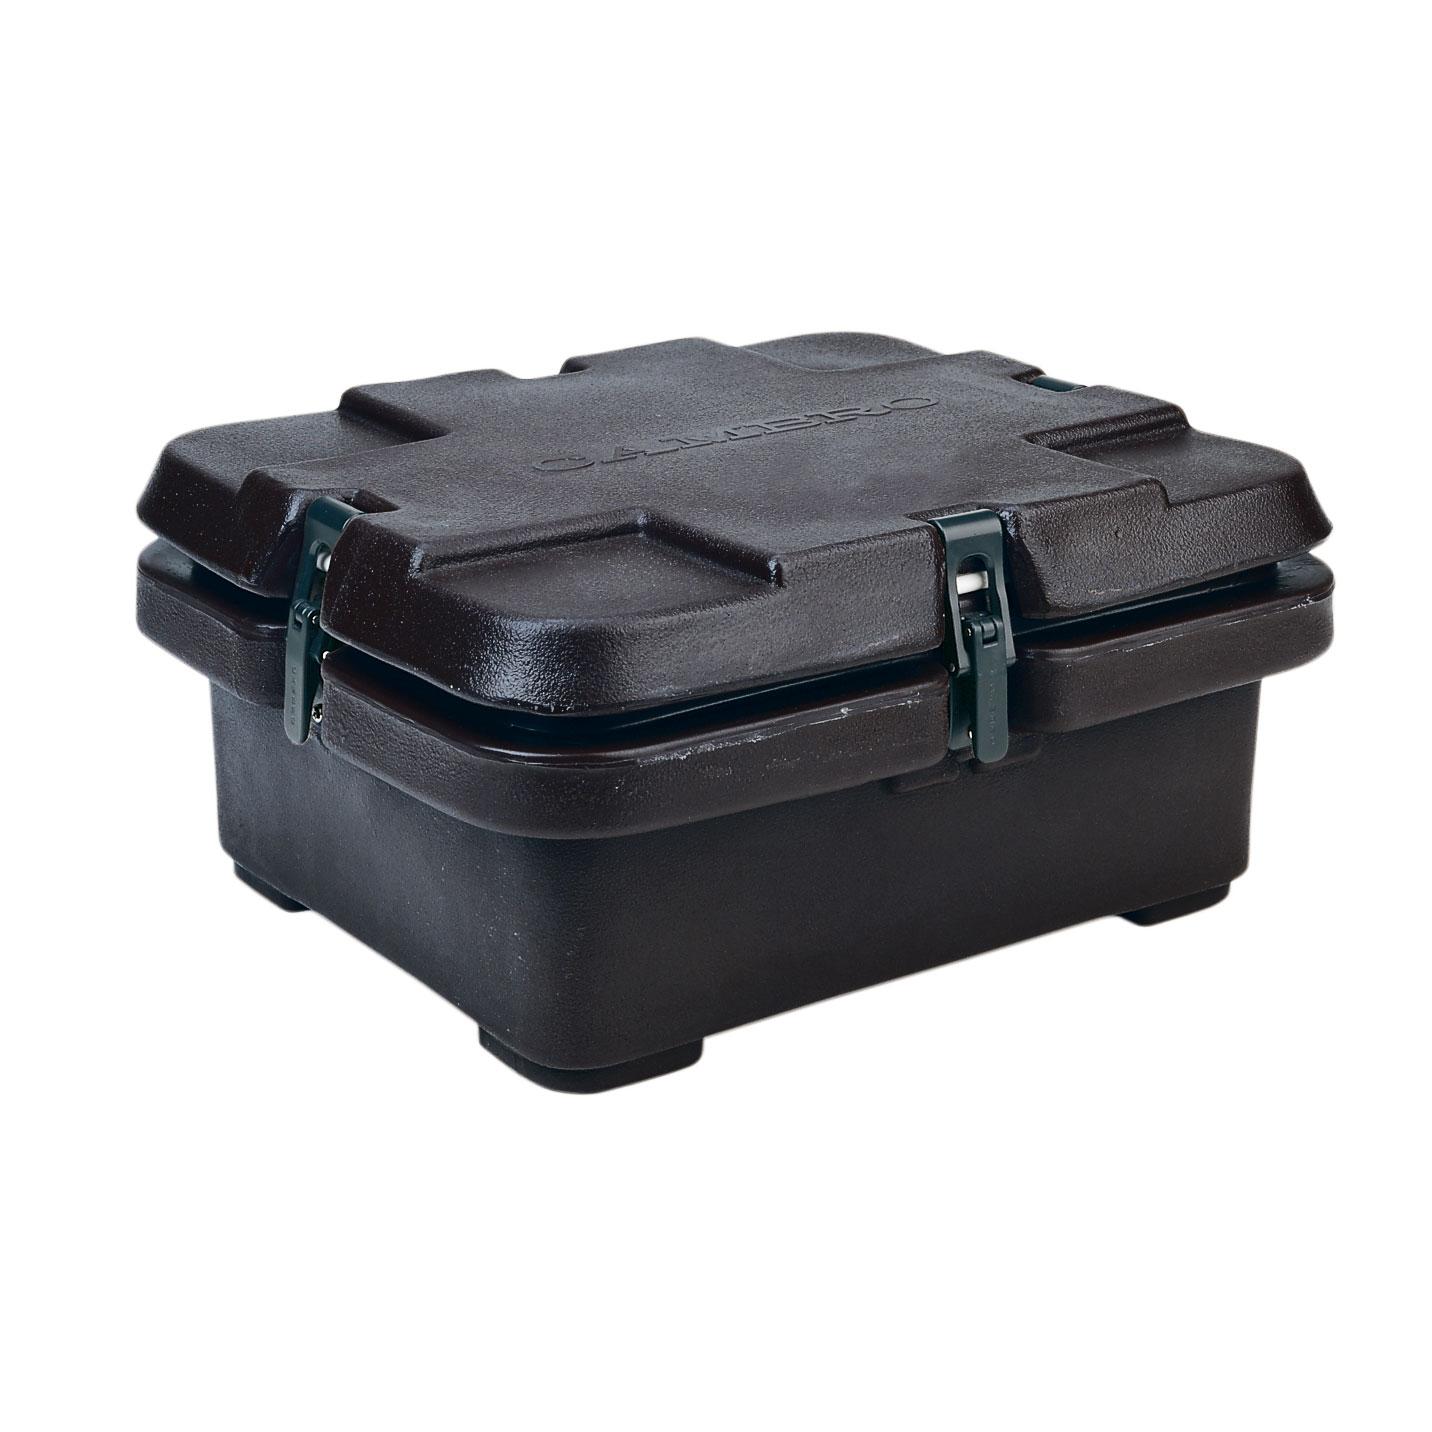 Cambro 240MPC110 insulated food storage